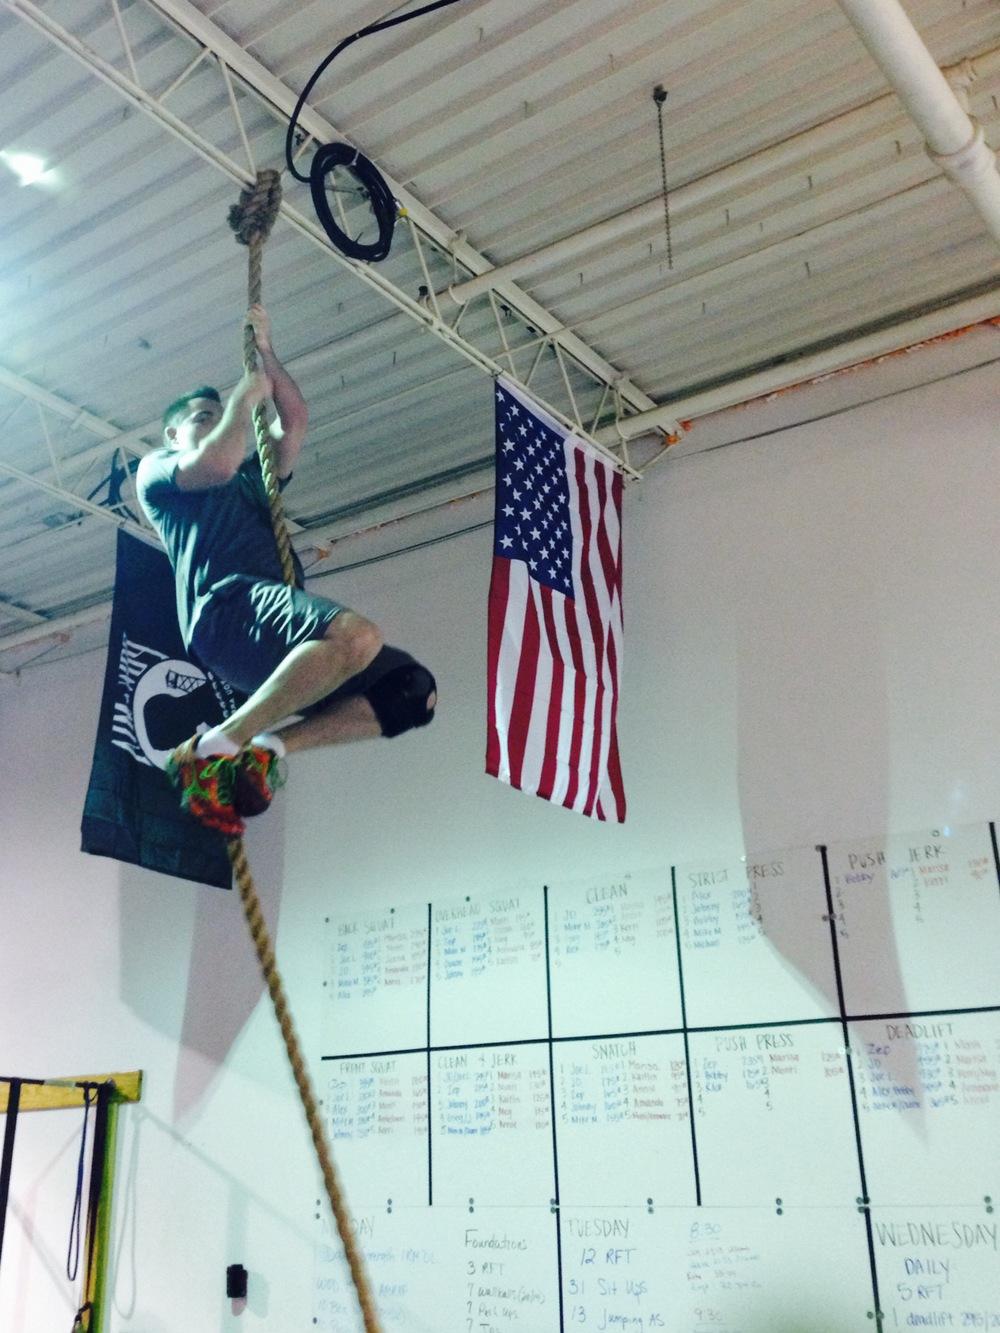 Brandon. Rope climb.